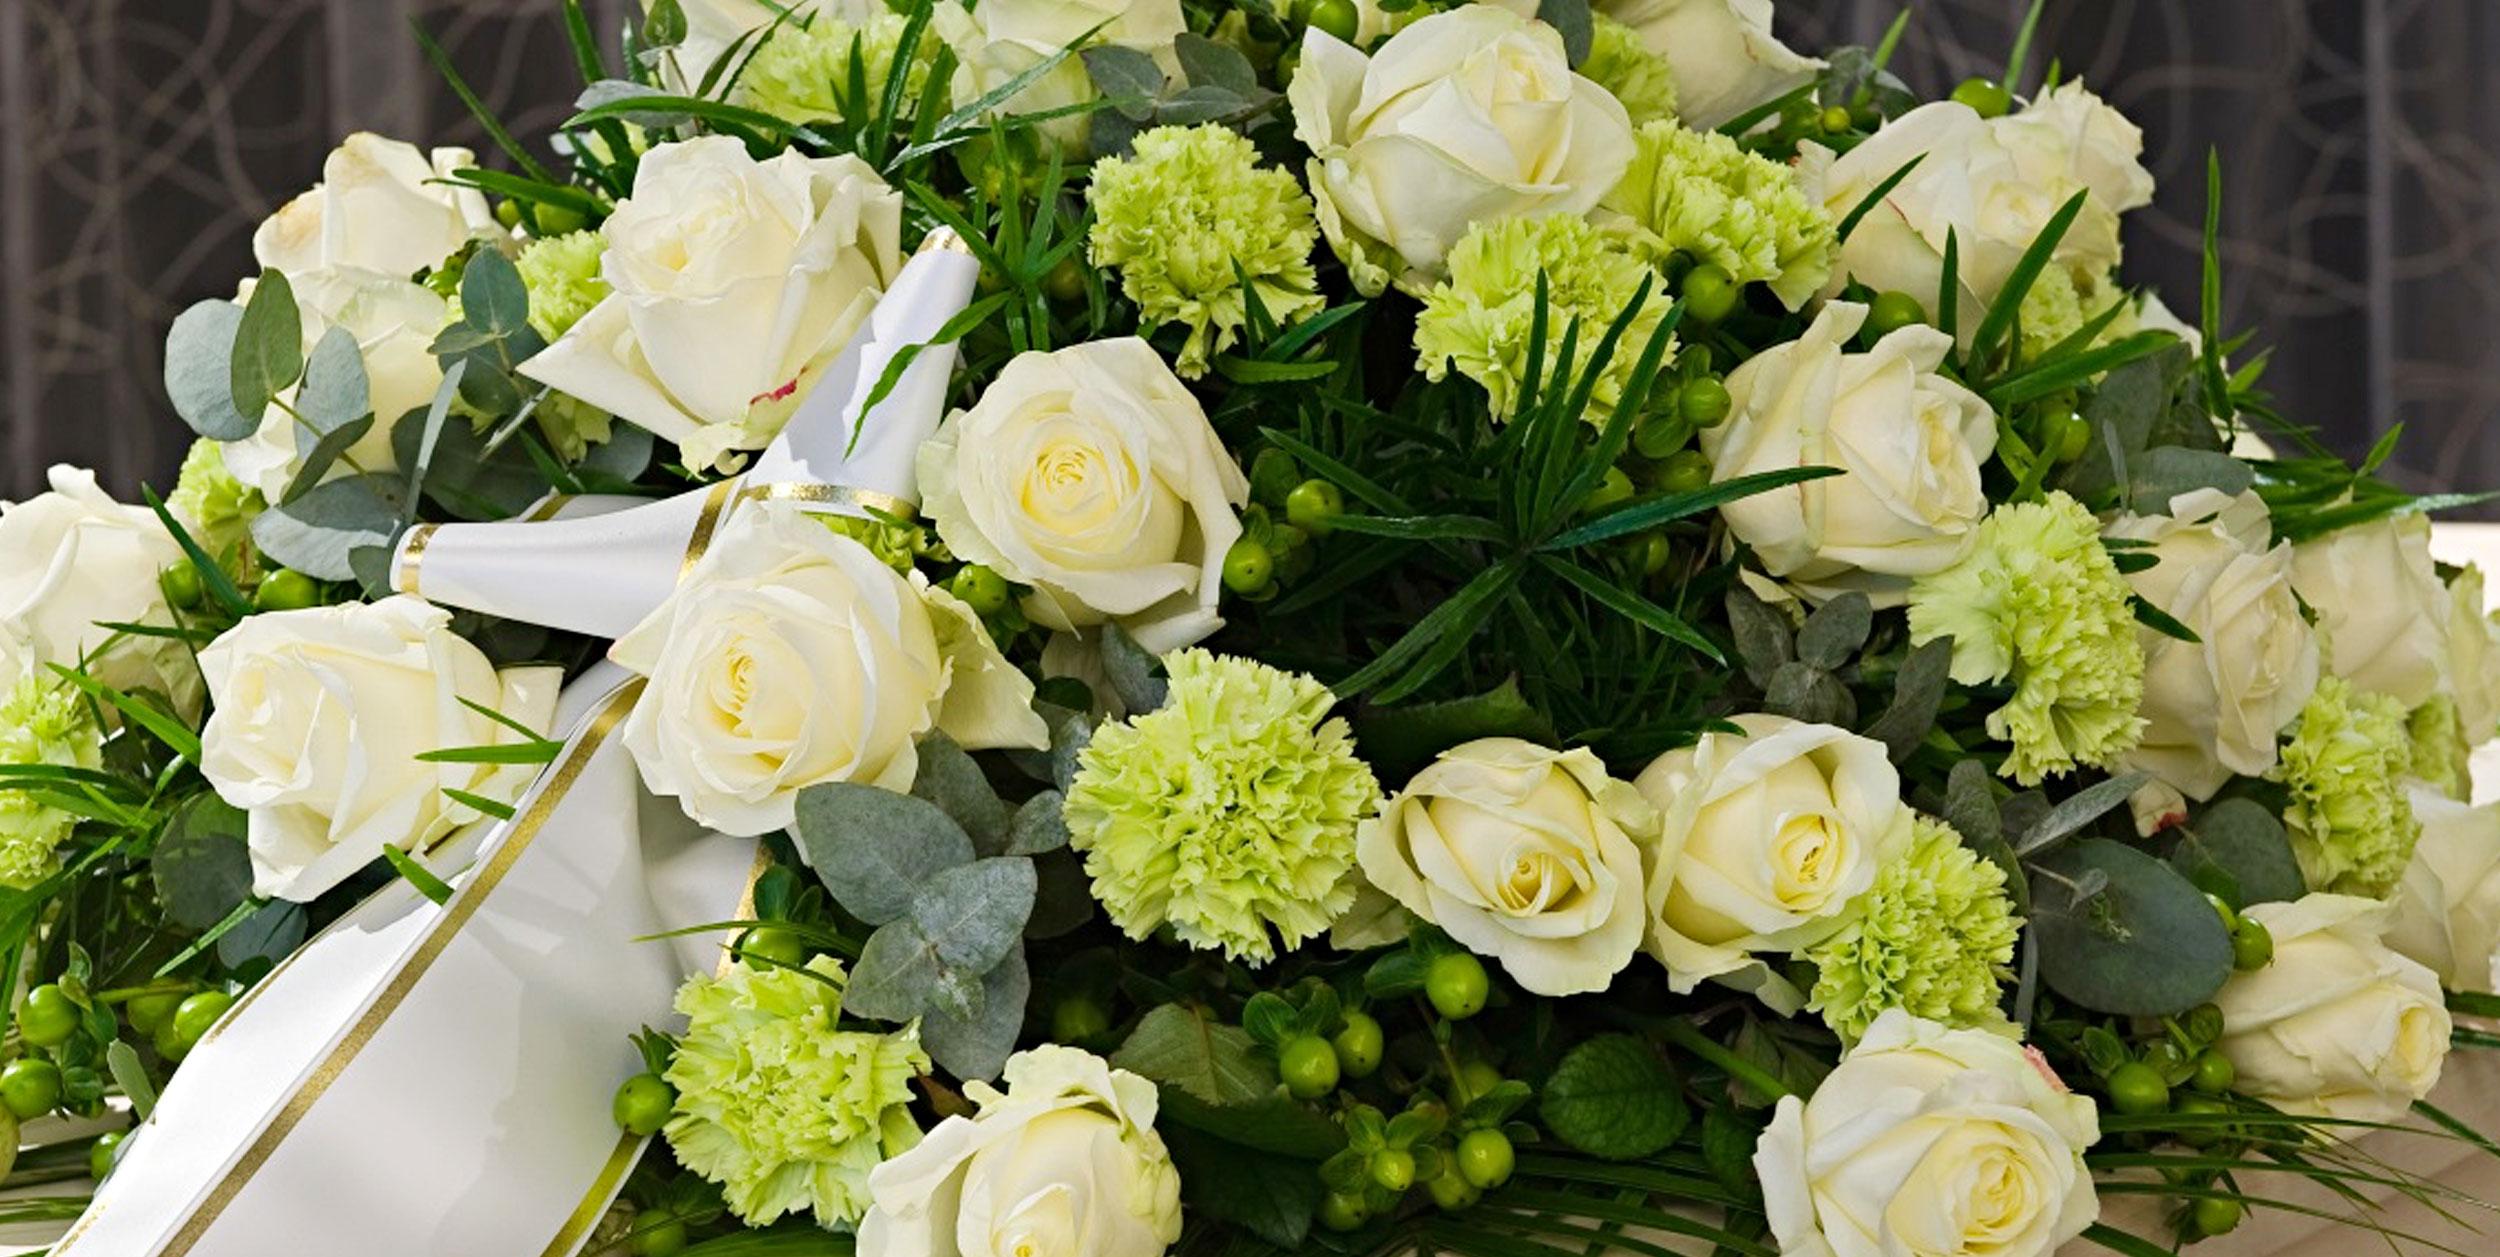 CherokeeMemorial_Banner_Flowers3.jpg